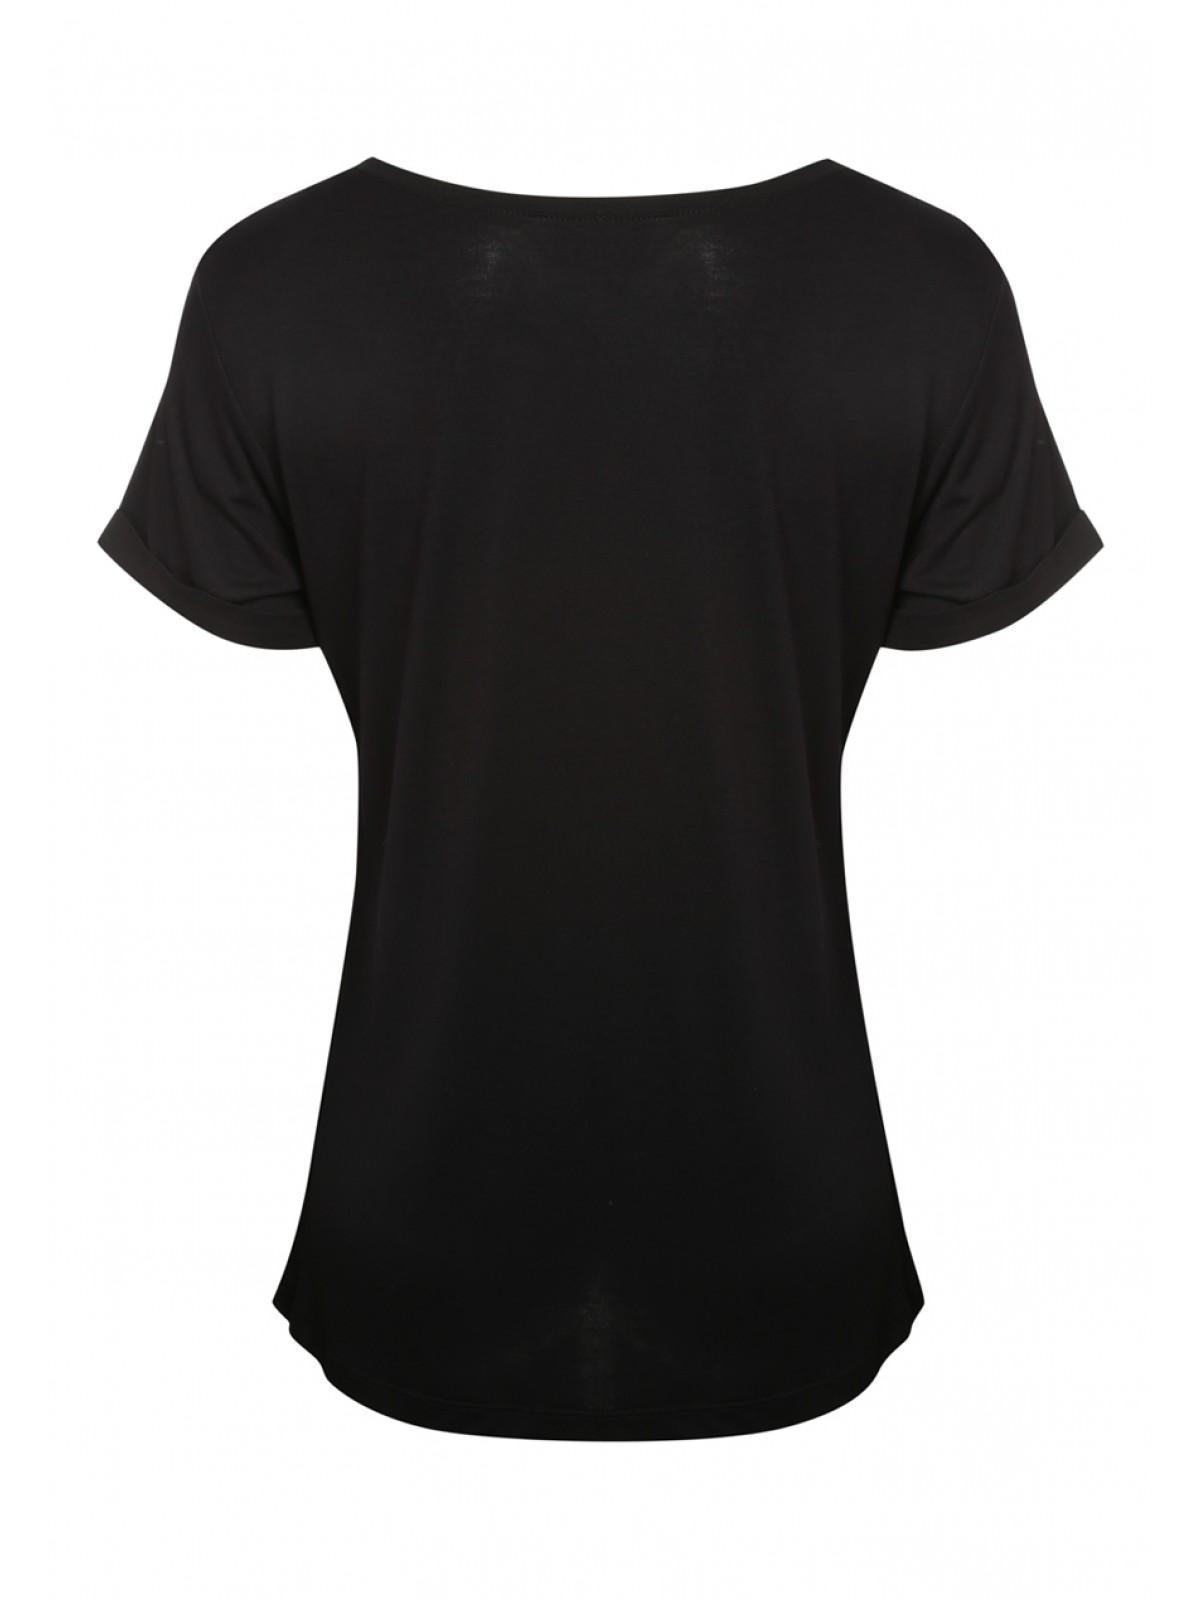 570d1b53 Home; Womens Sequin Heart Print T-shirt. Back. PreviousNext